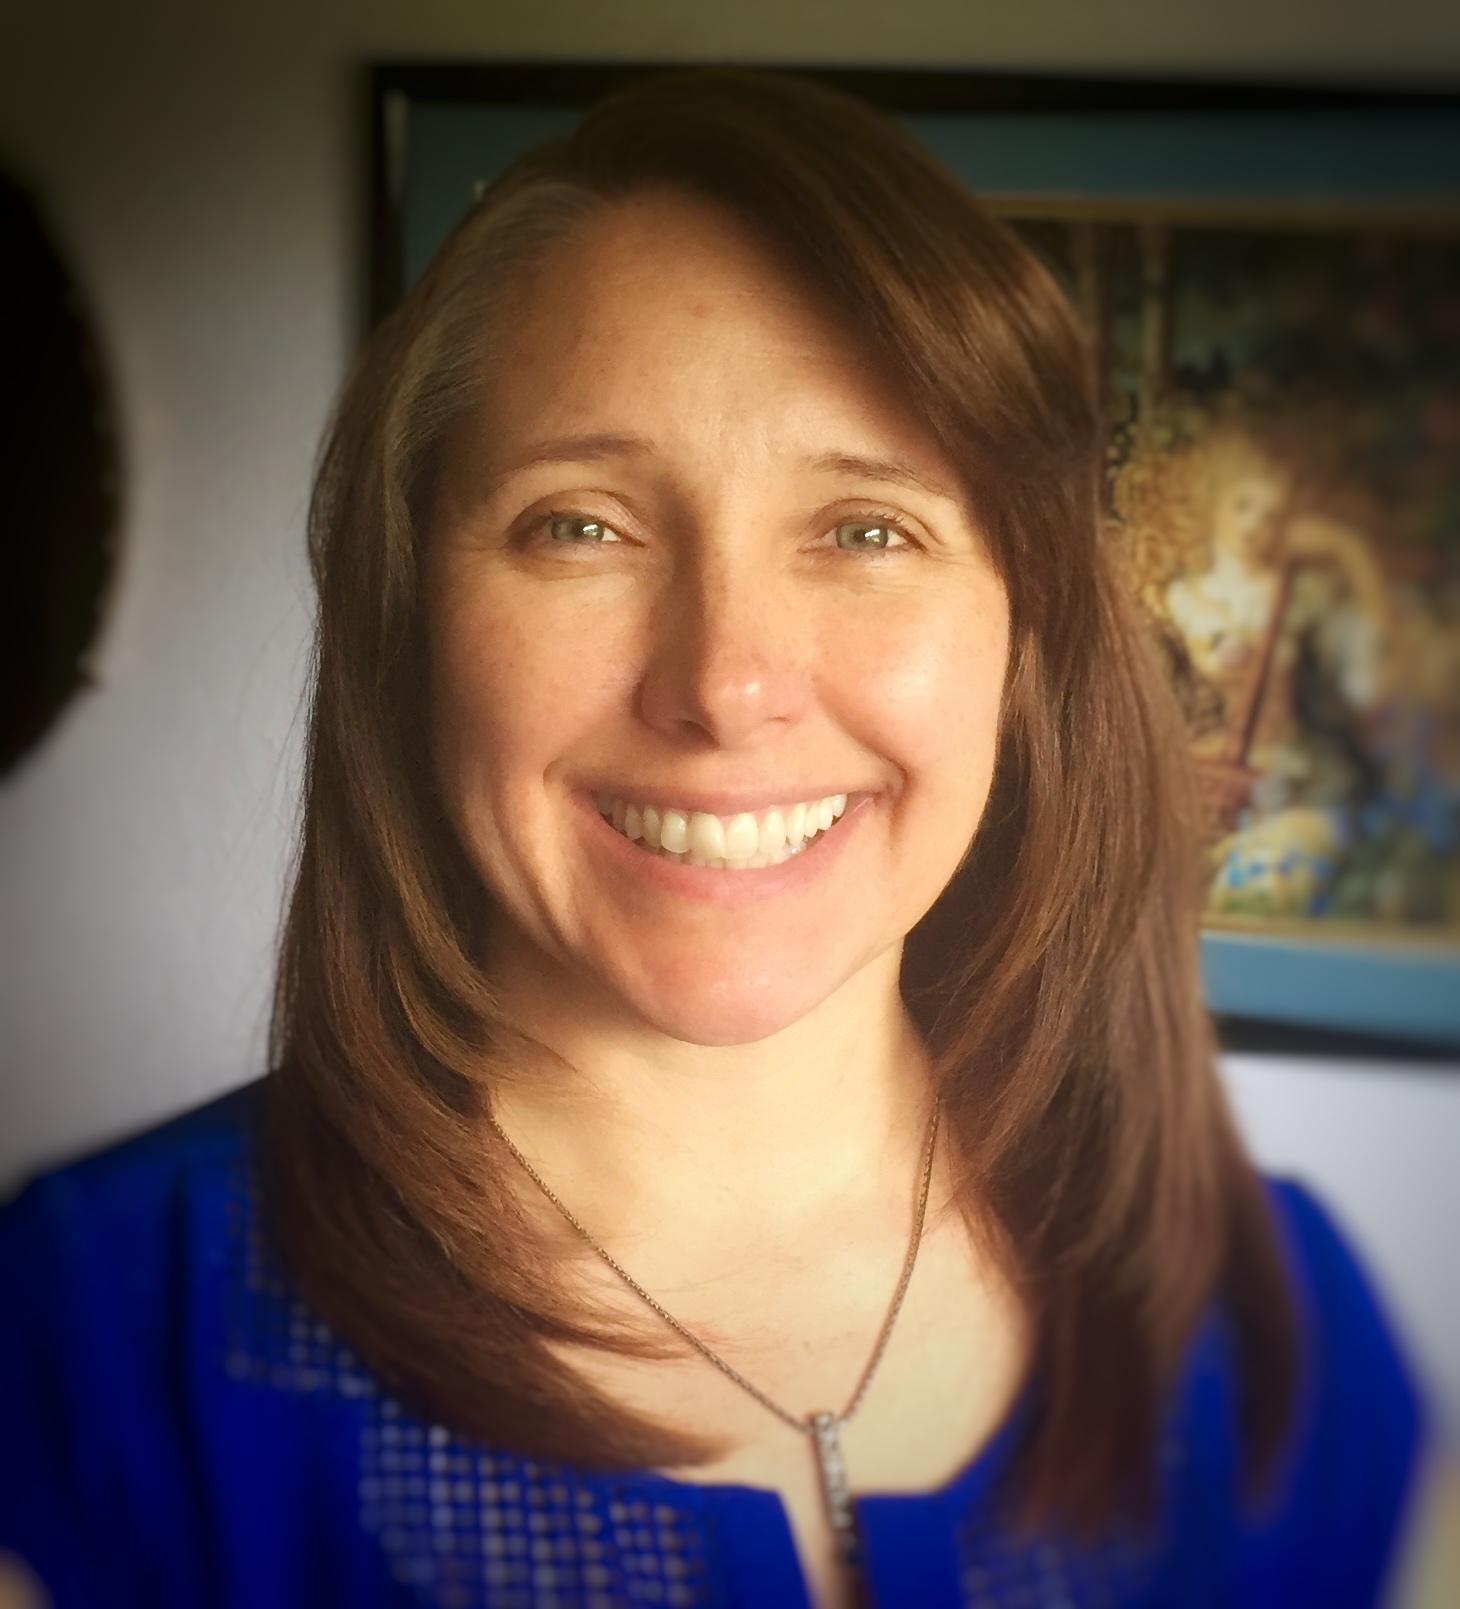 CHRISTINA SIERRAJONES, EDUCATOR